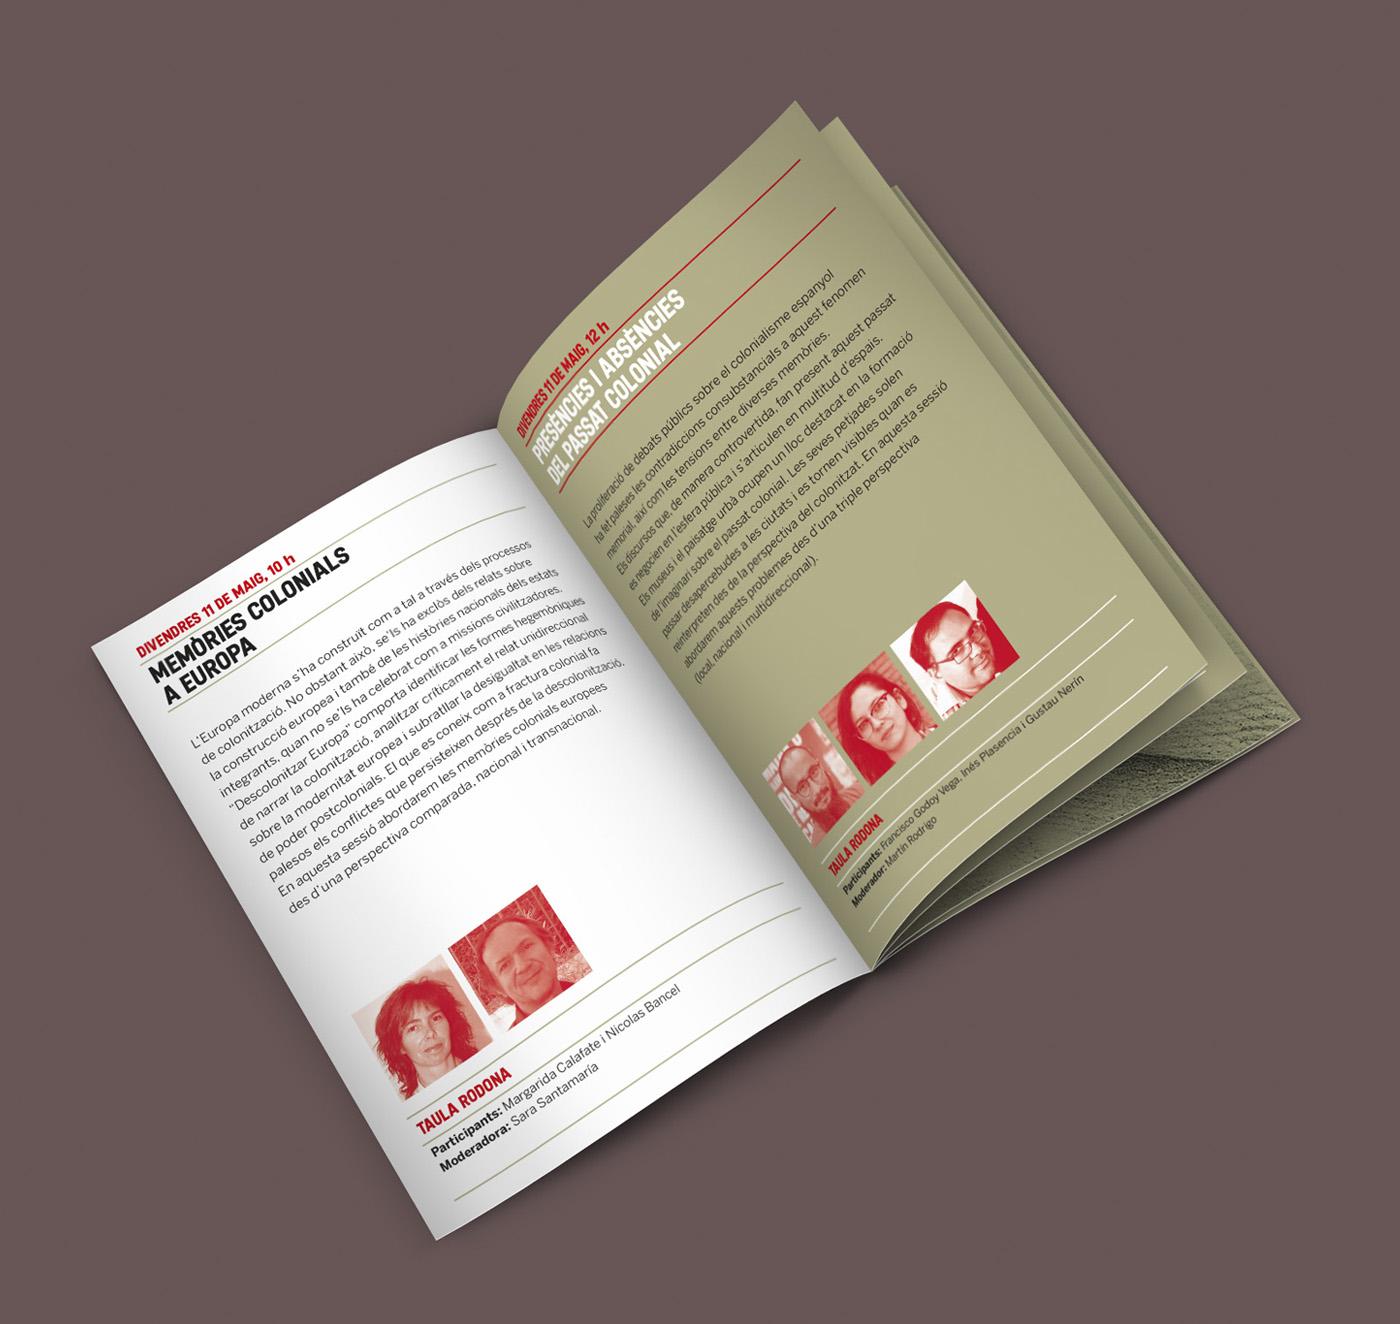 librito-conferencias-born-programa